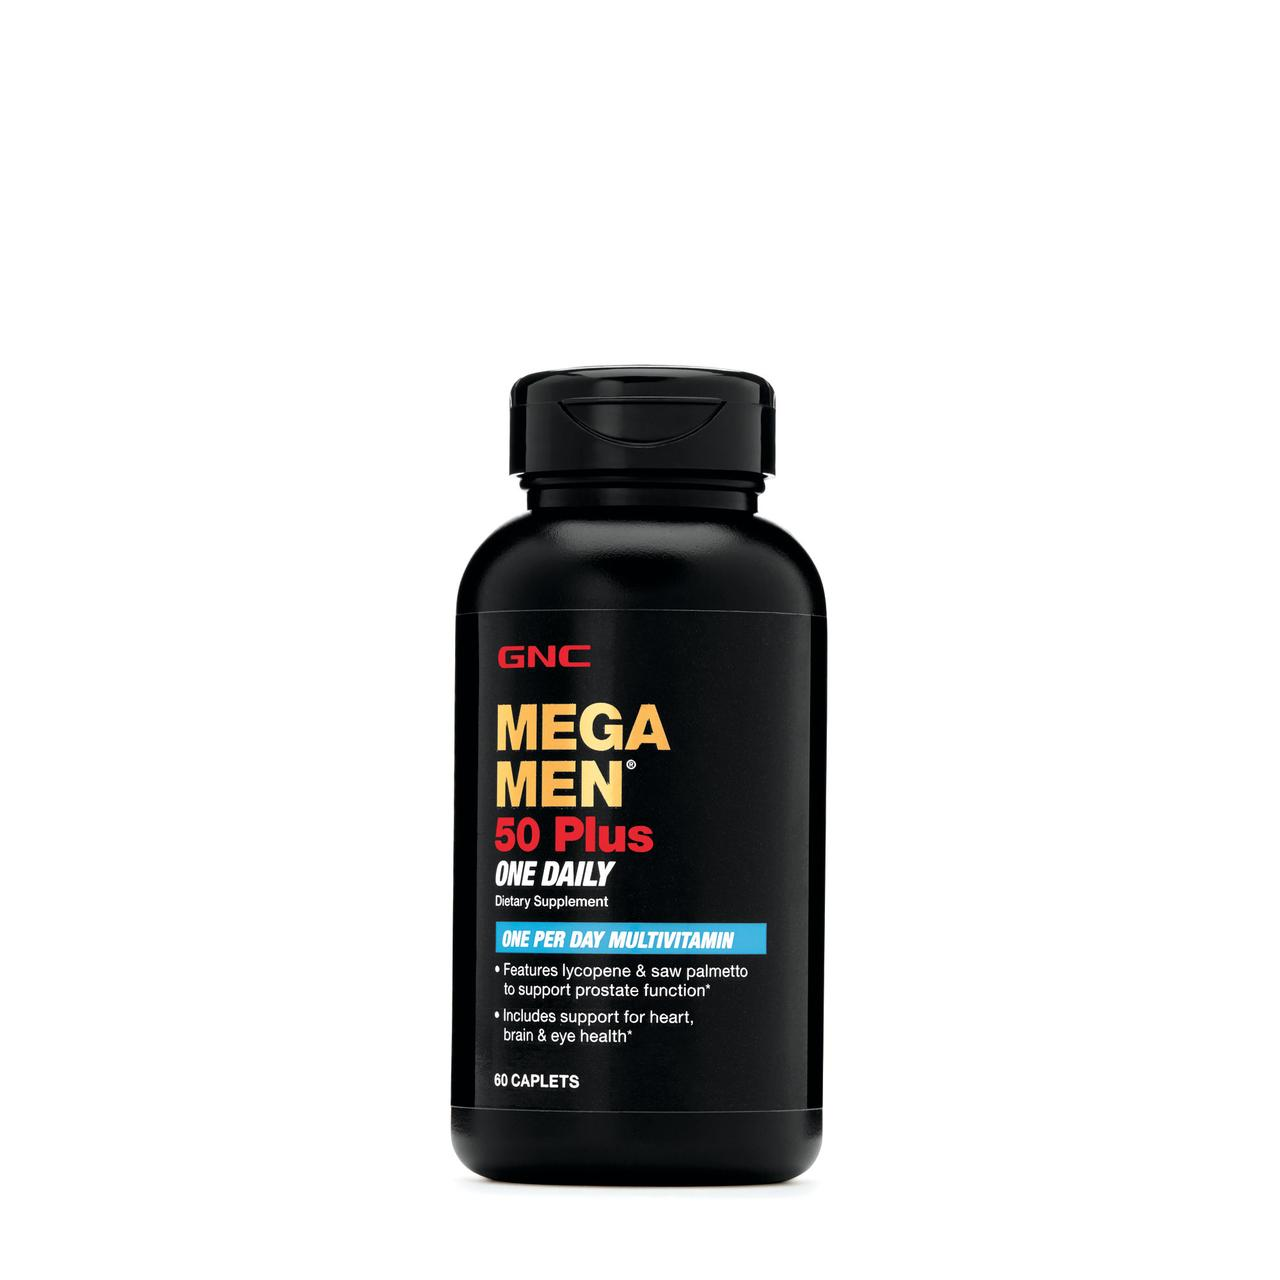 Витамины для мужчин GNC Mega Men 50 Plus One Daily Multivitamin 60 caplets